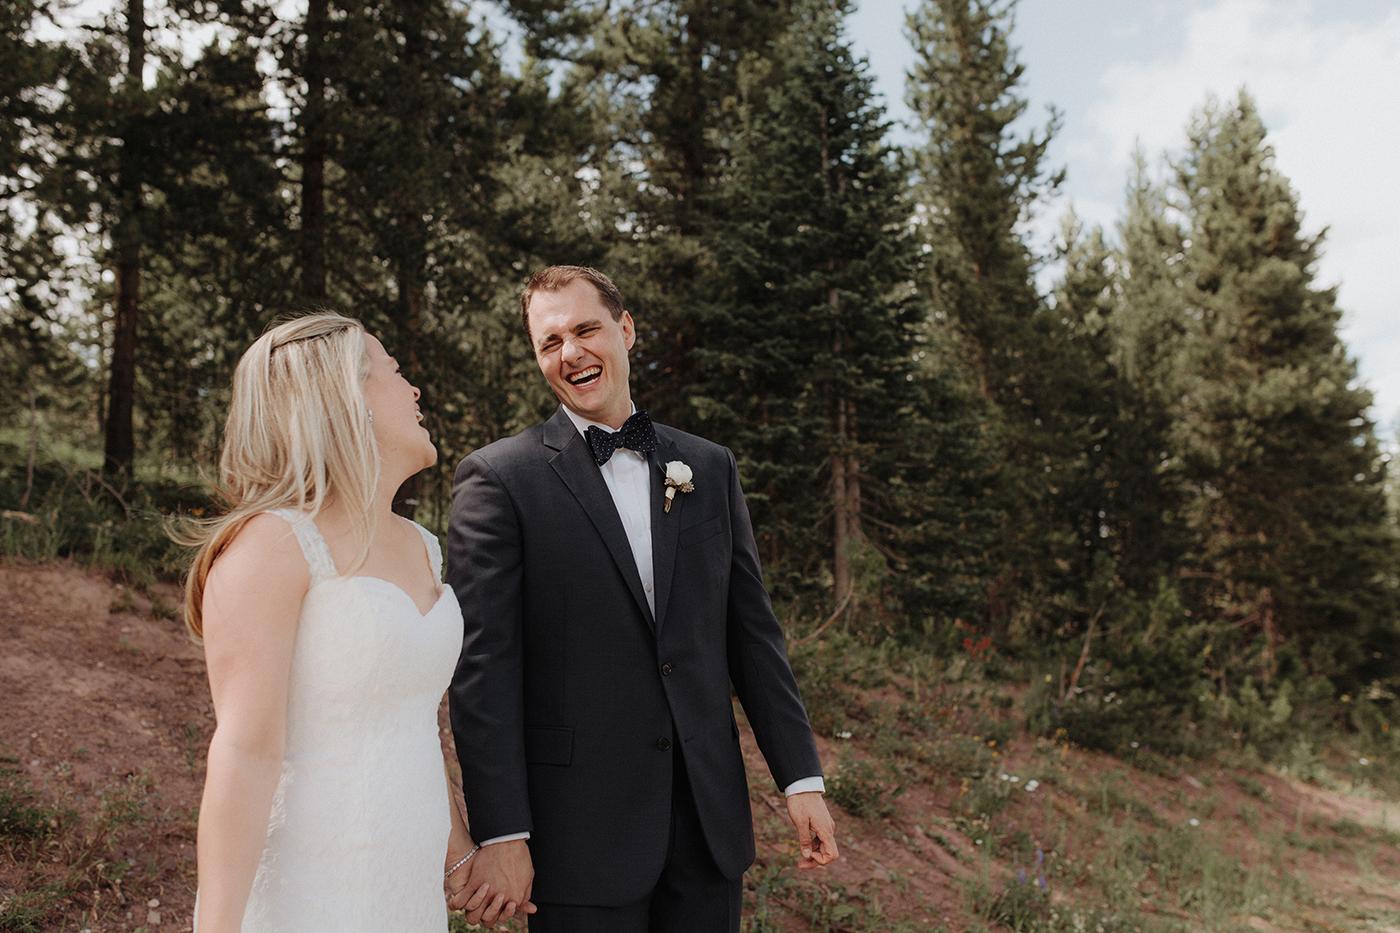 vail-colorado-wedding-photographer-mountain-top-first-look-2.jpg